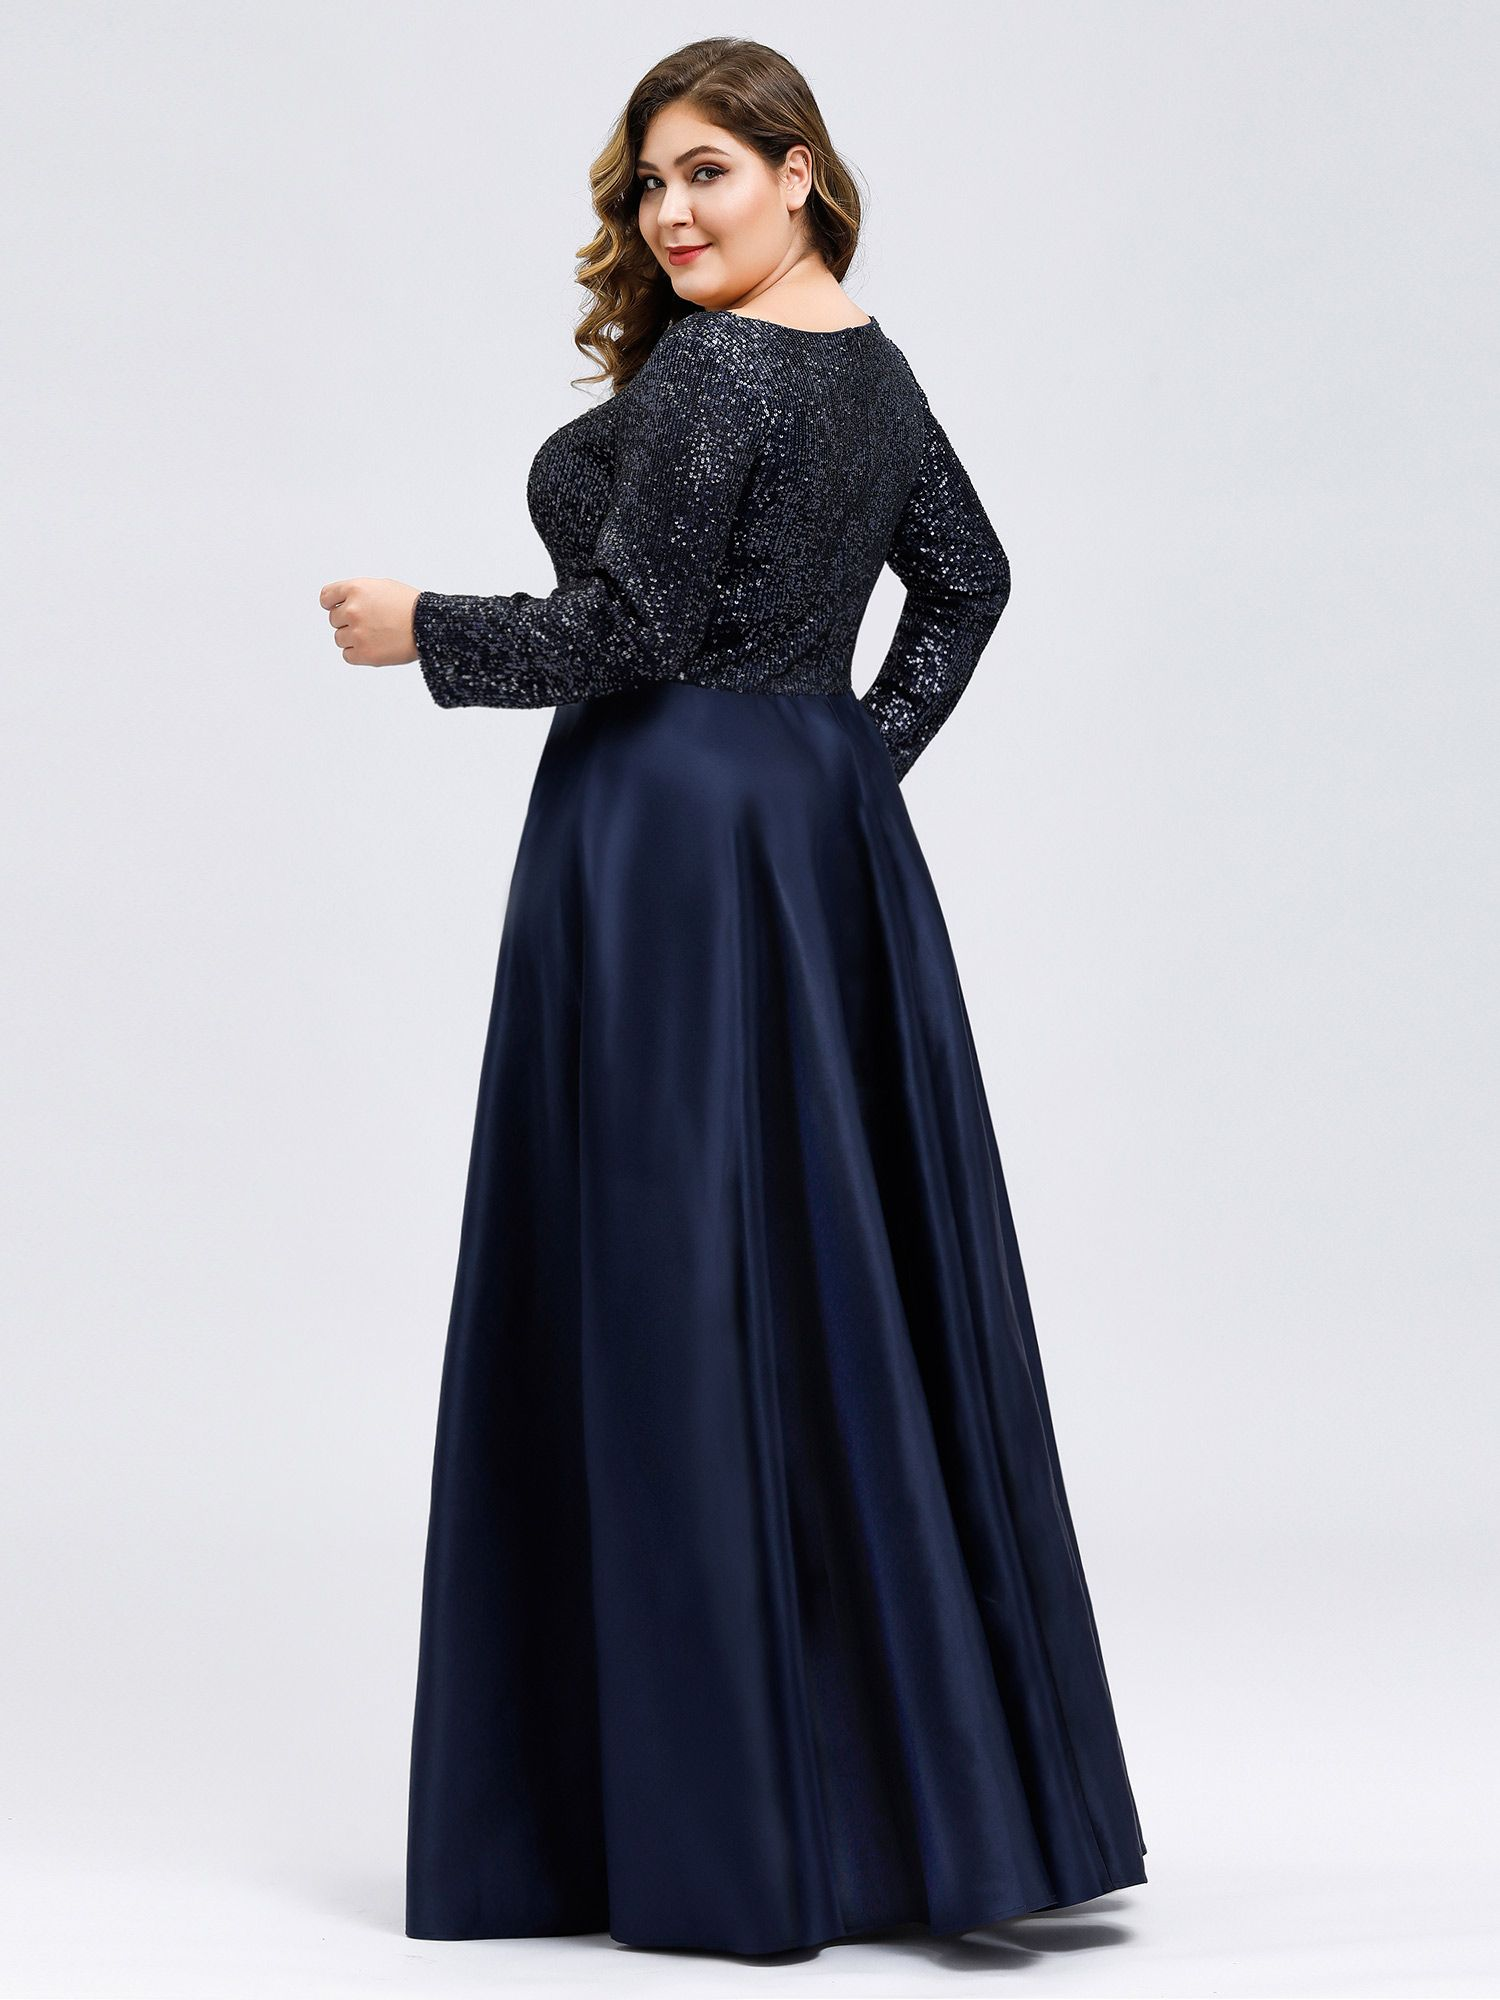 Everpretty womens plus size formal evening prom dresses